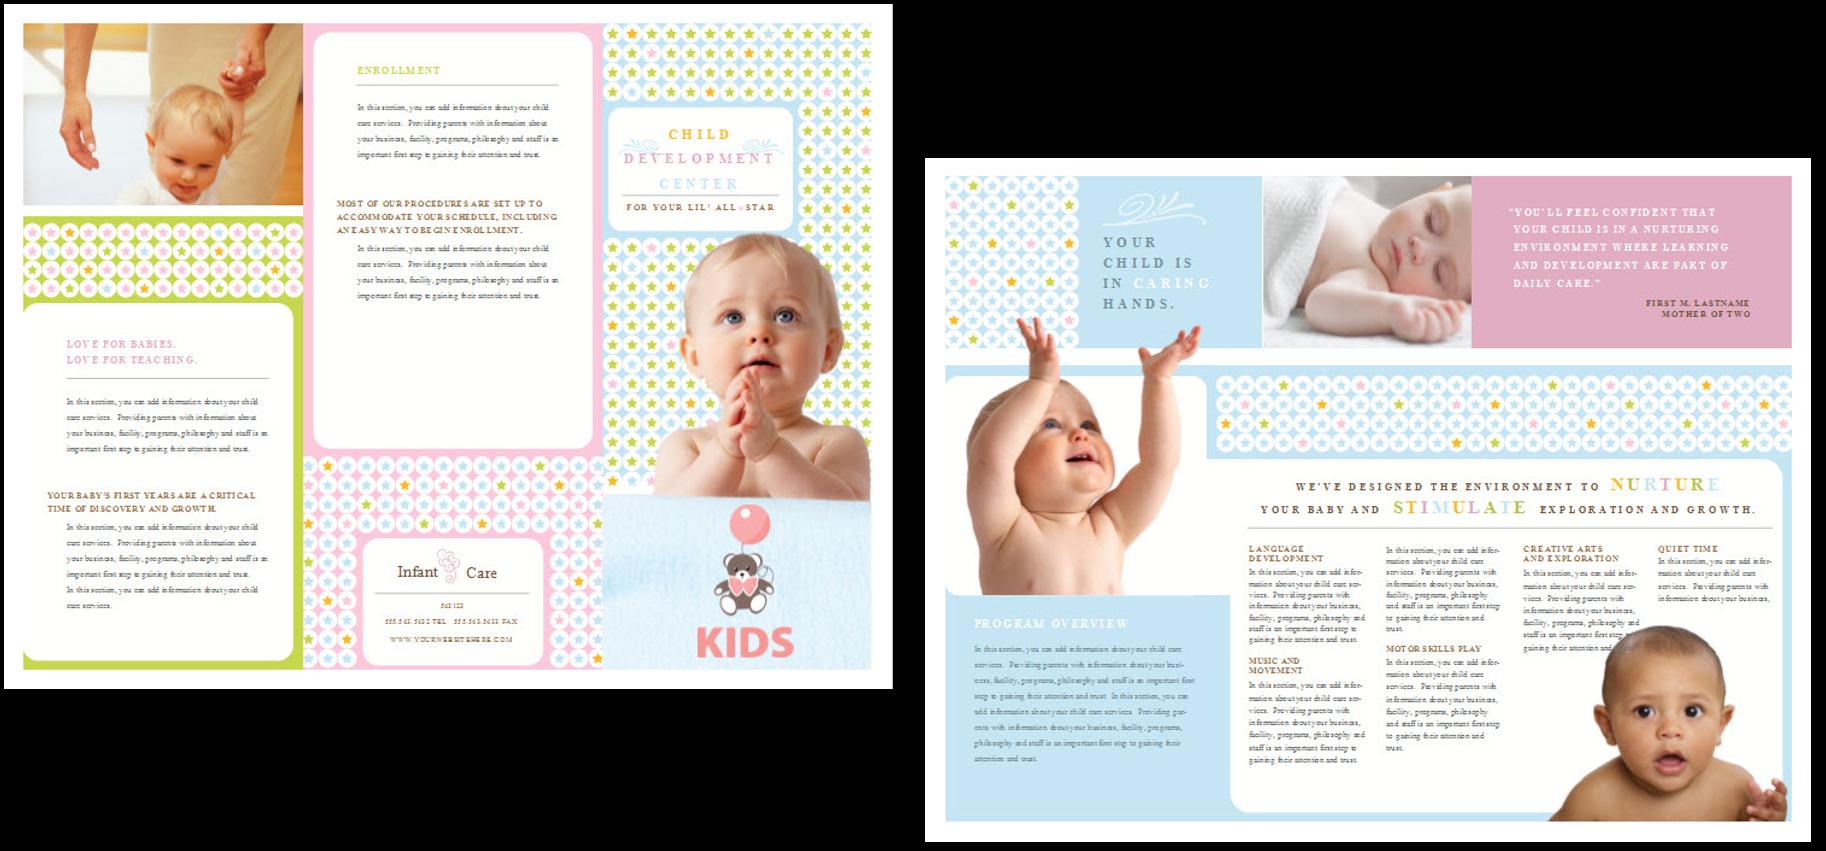 child care brochure templates - child care brochure template 8 child care owner